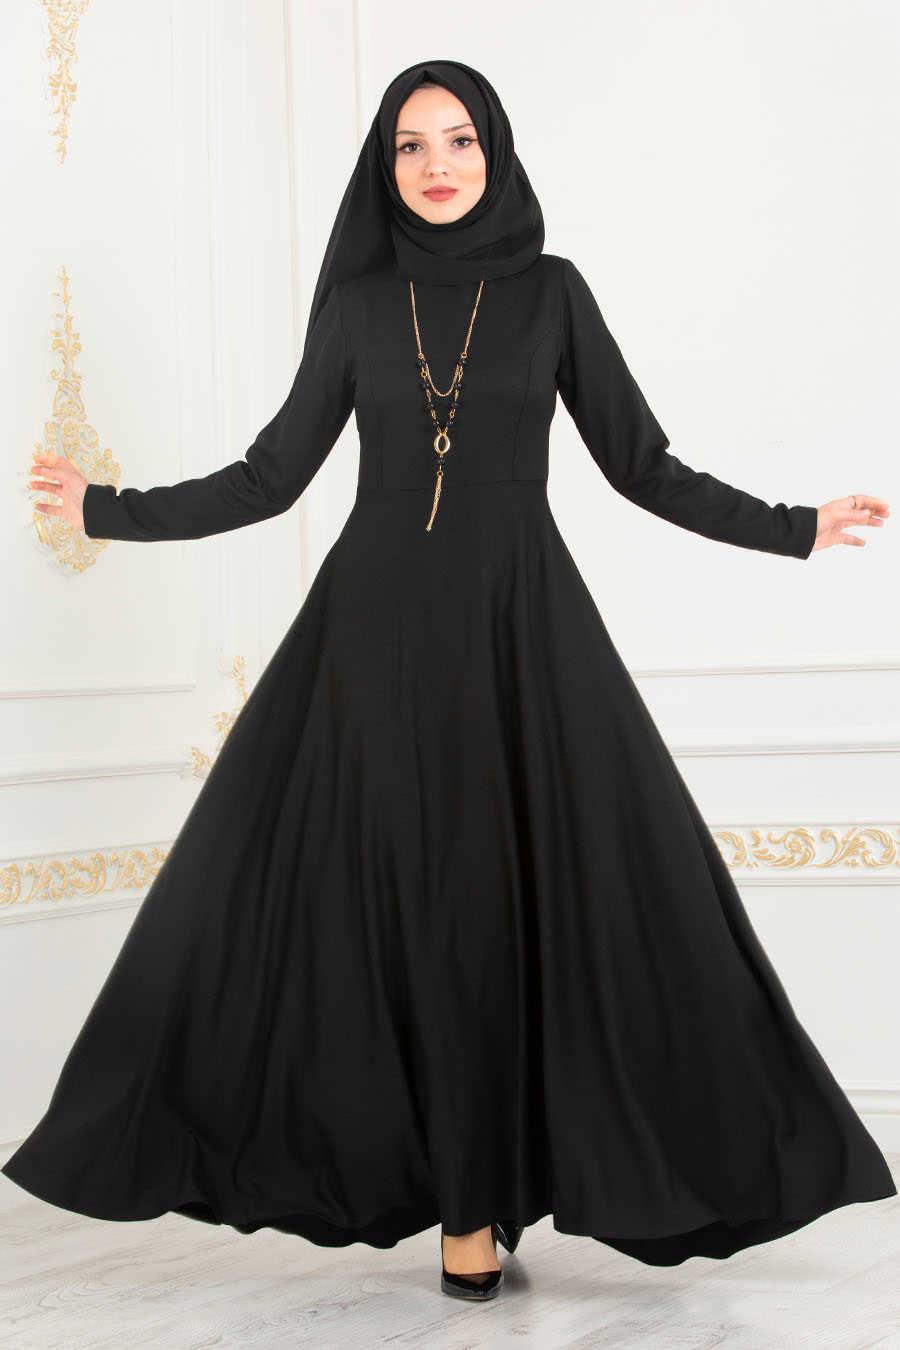 Neva Style - Black Hijab Dress 8040S